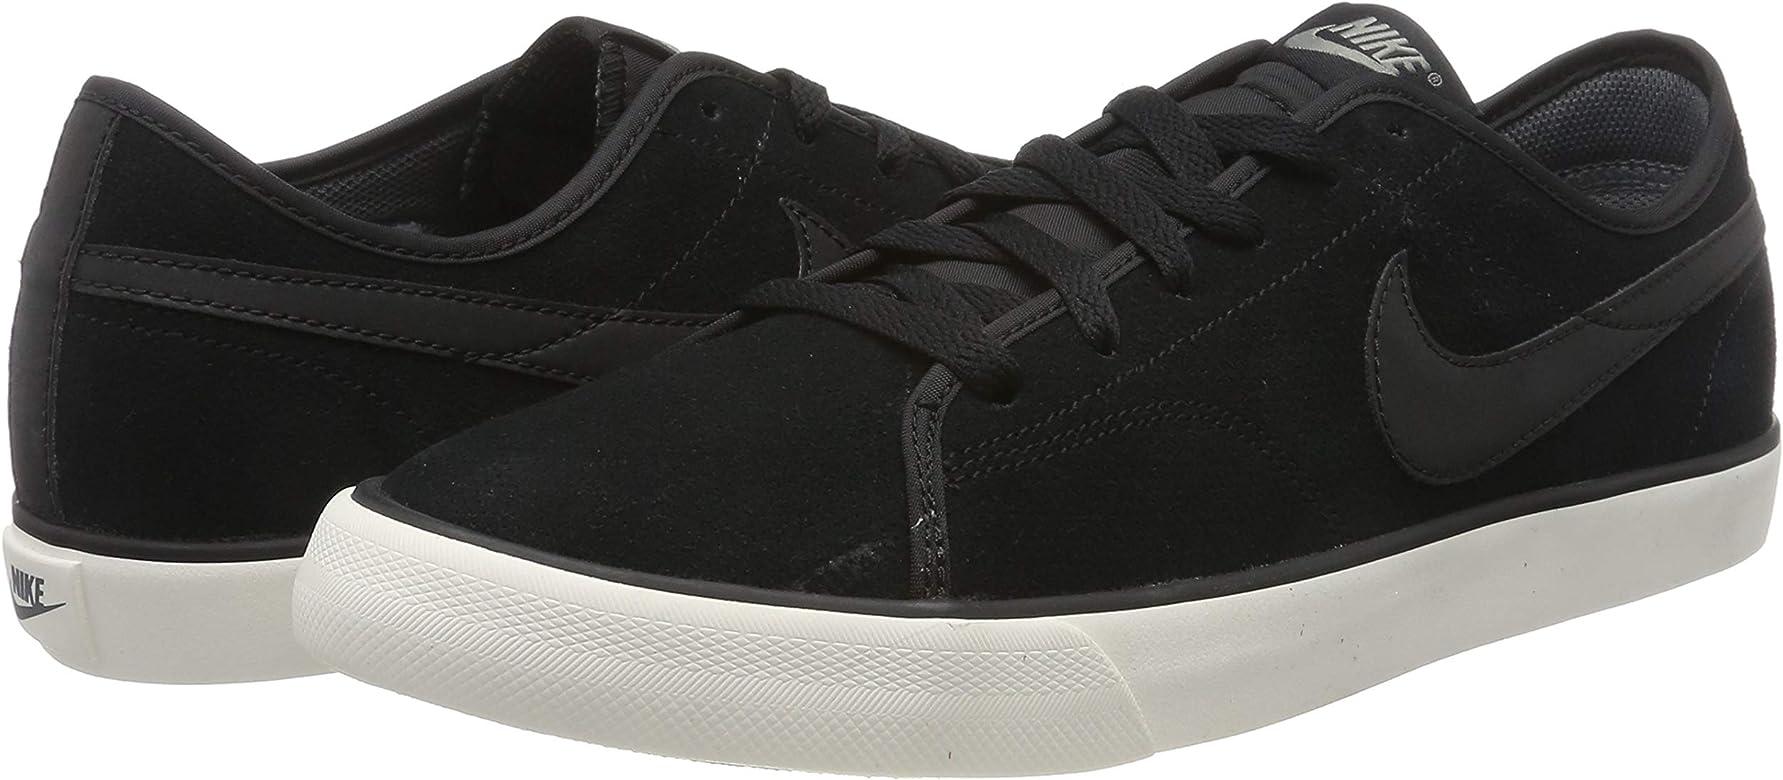 Nike Primo Court Leather 644826-006, Zapatillas de Tenis para ...